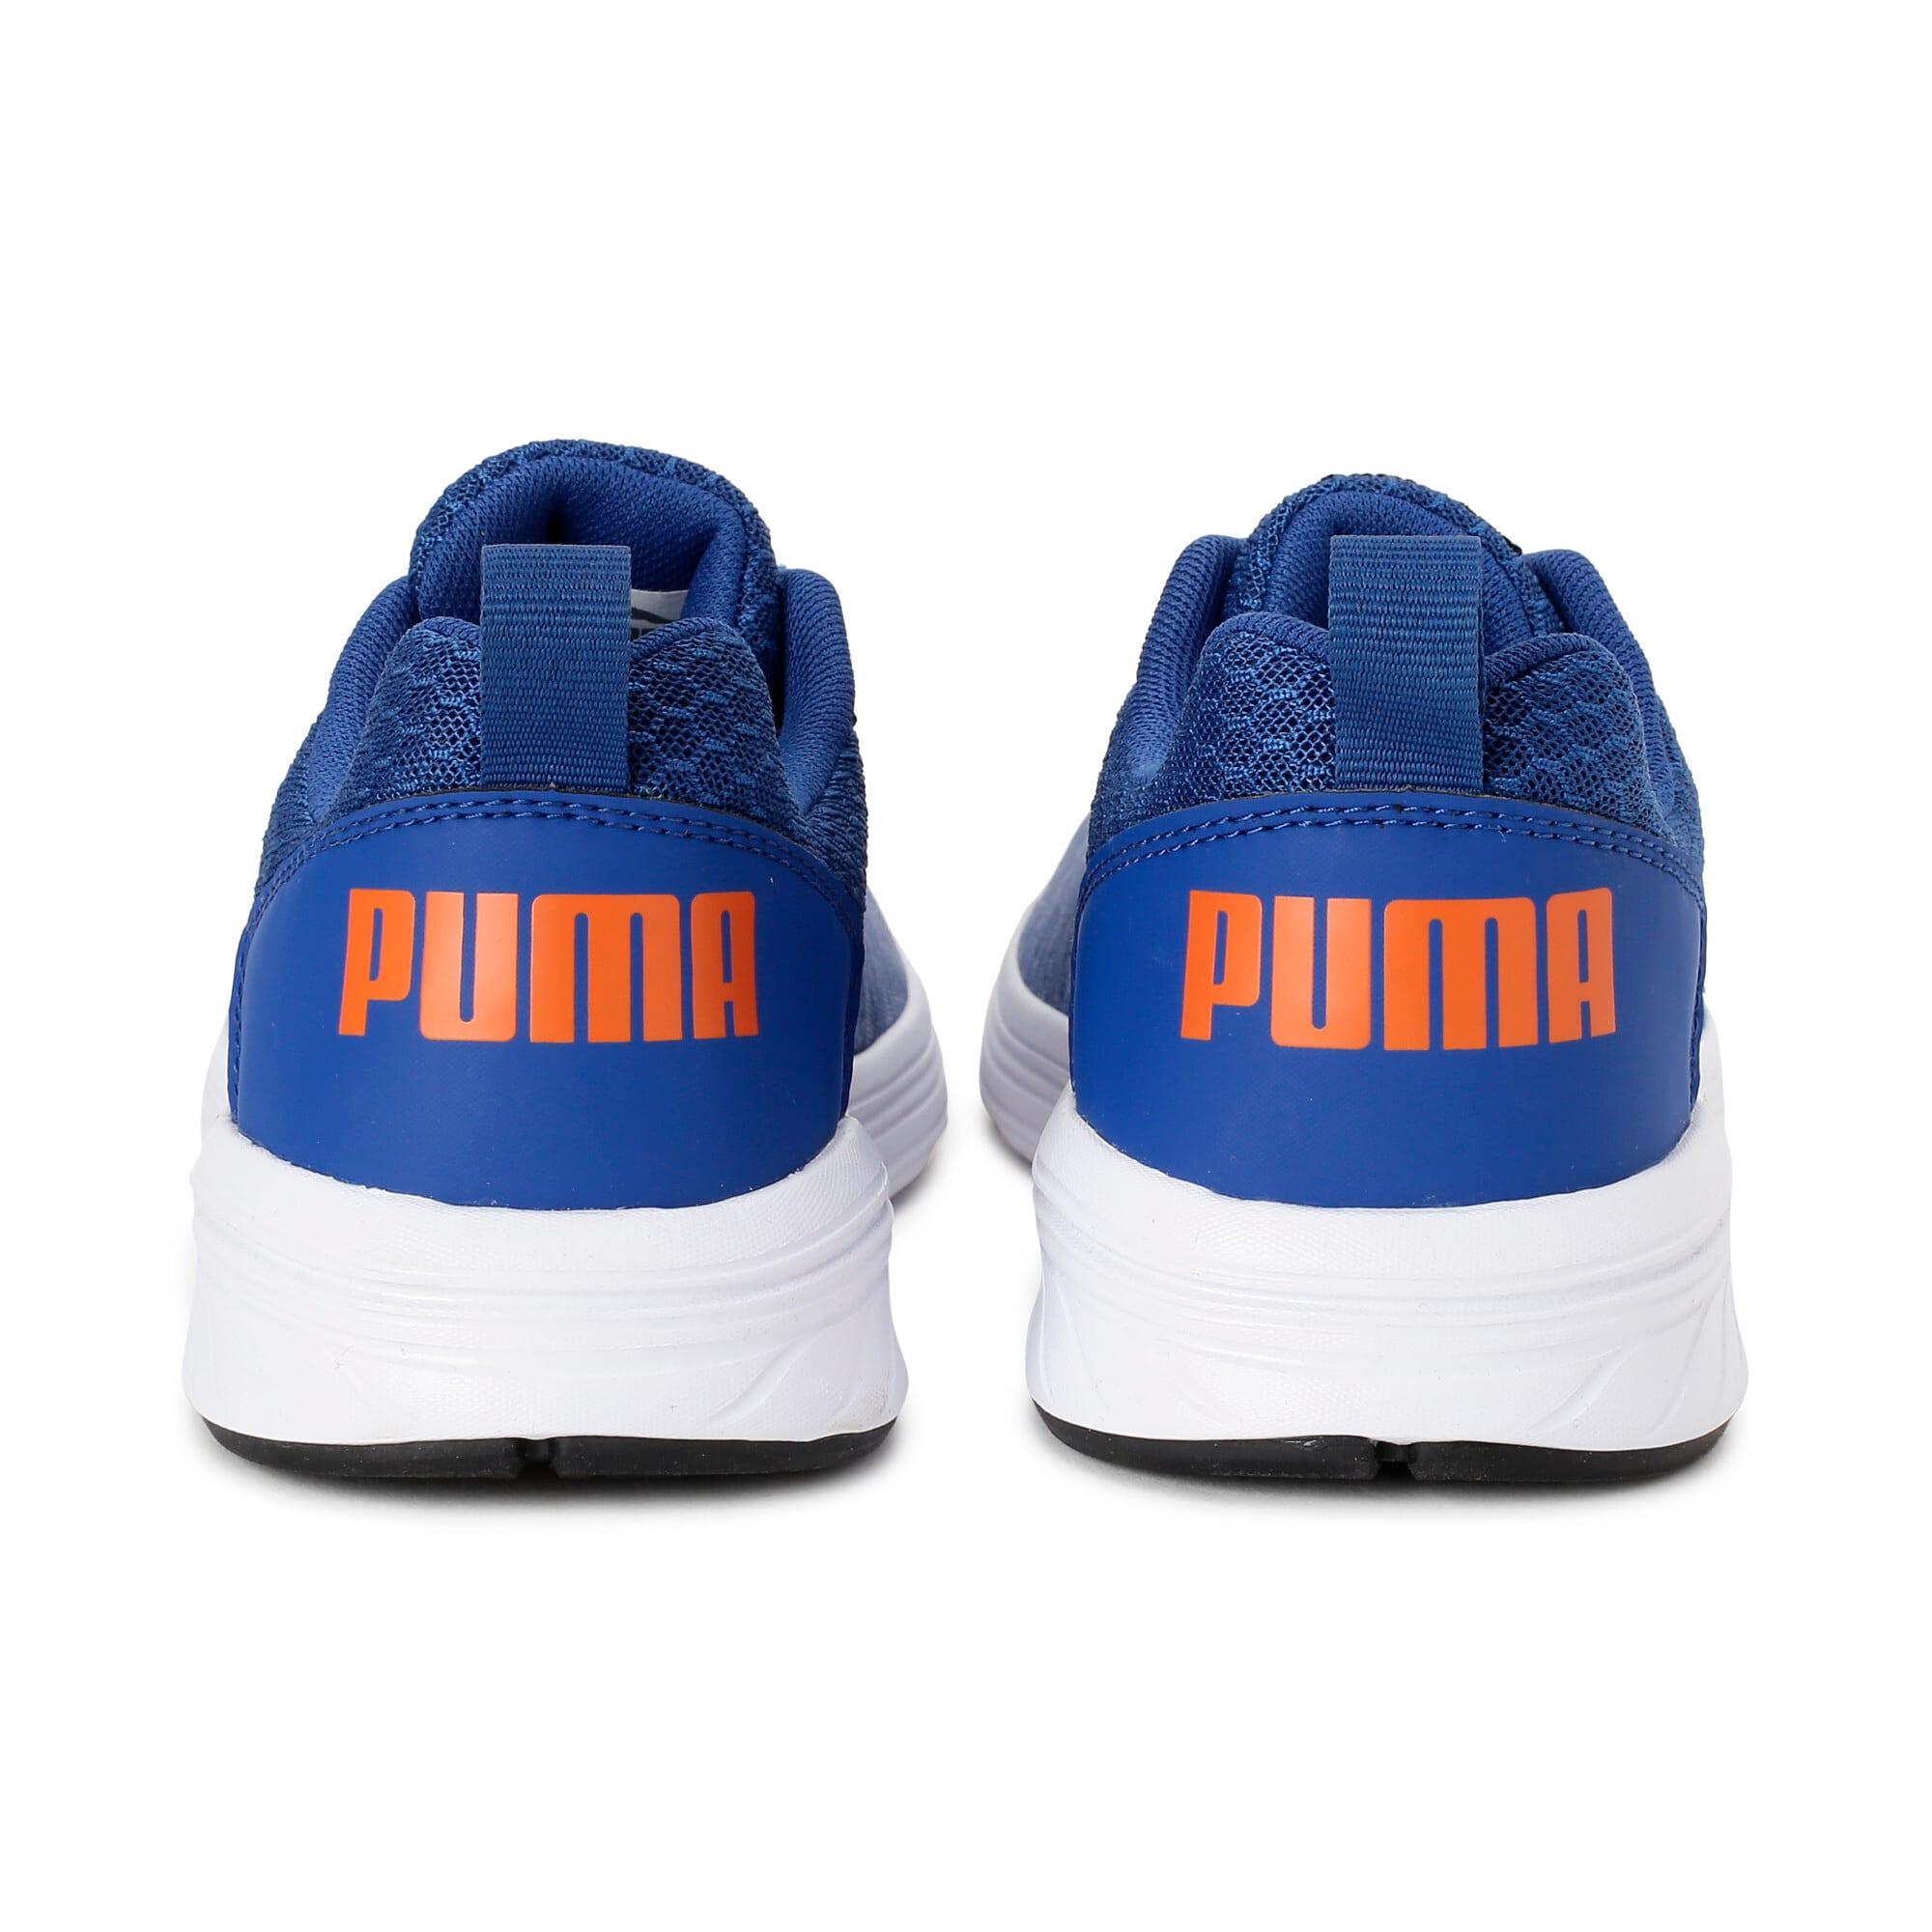 Thumbnail 2 of NRGY Comet Kids' Training Shoes, Galaxy Blue-White-Orange, medium-IND